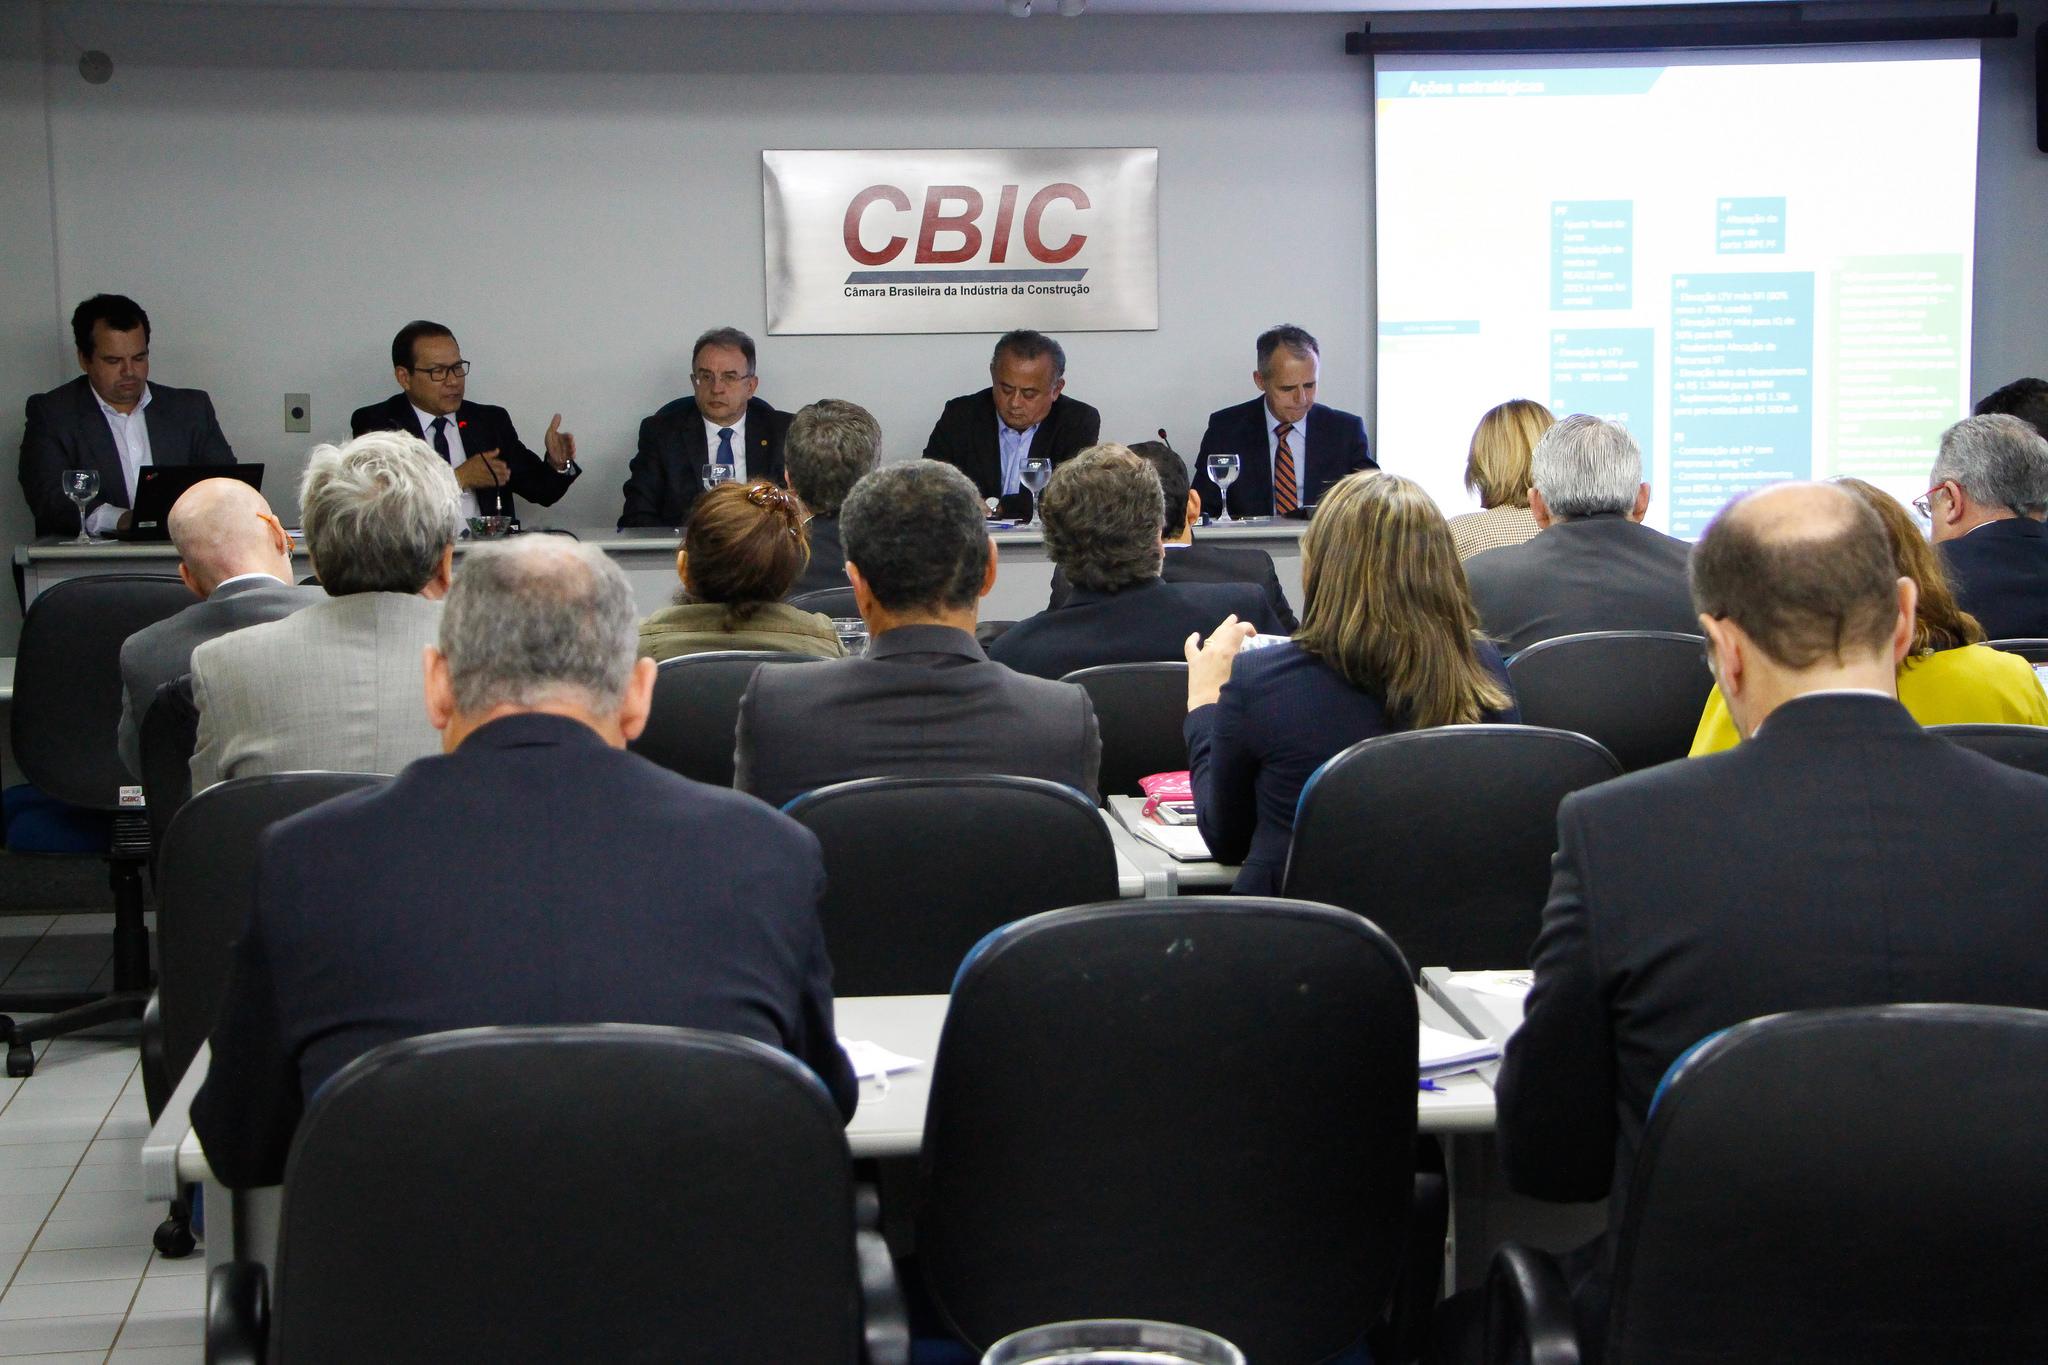 Banco do Brasil agiliza processo de análise de crédito